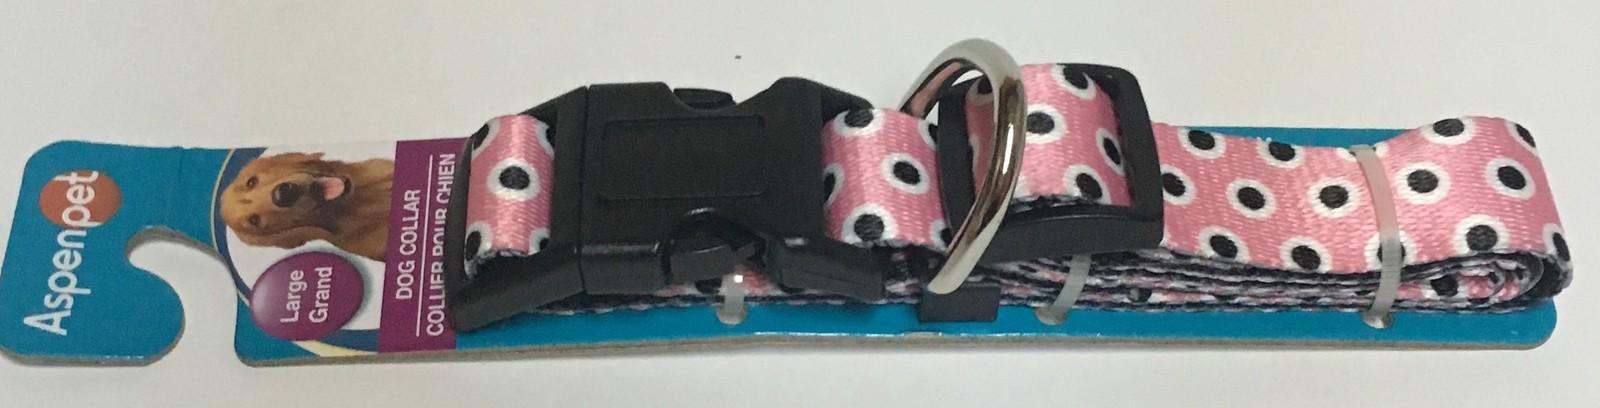 "Aspen Pet Large Dog Collar Pink & Black Polka Dot 16""-26"" Adjustable Nylon"